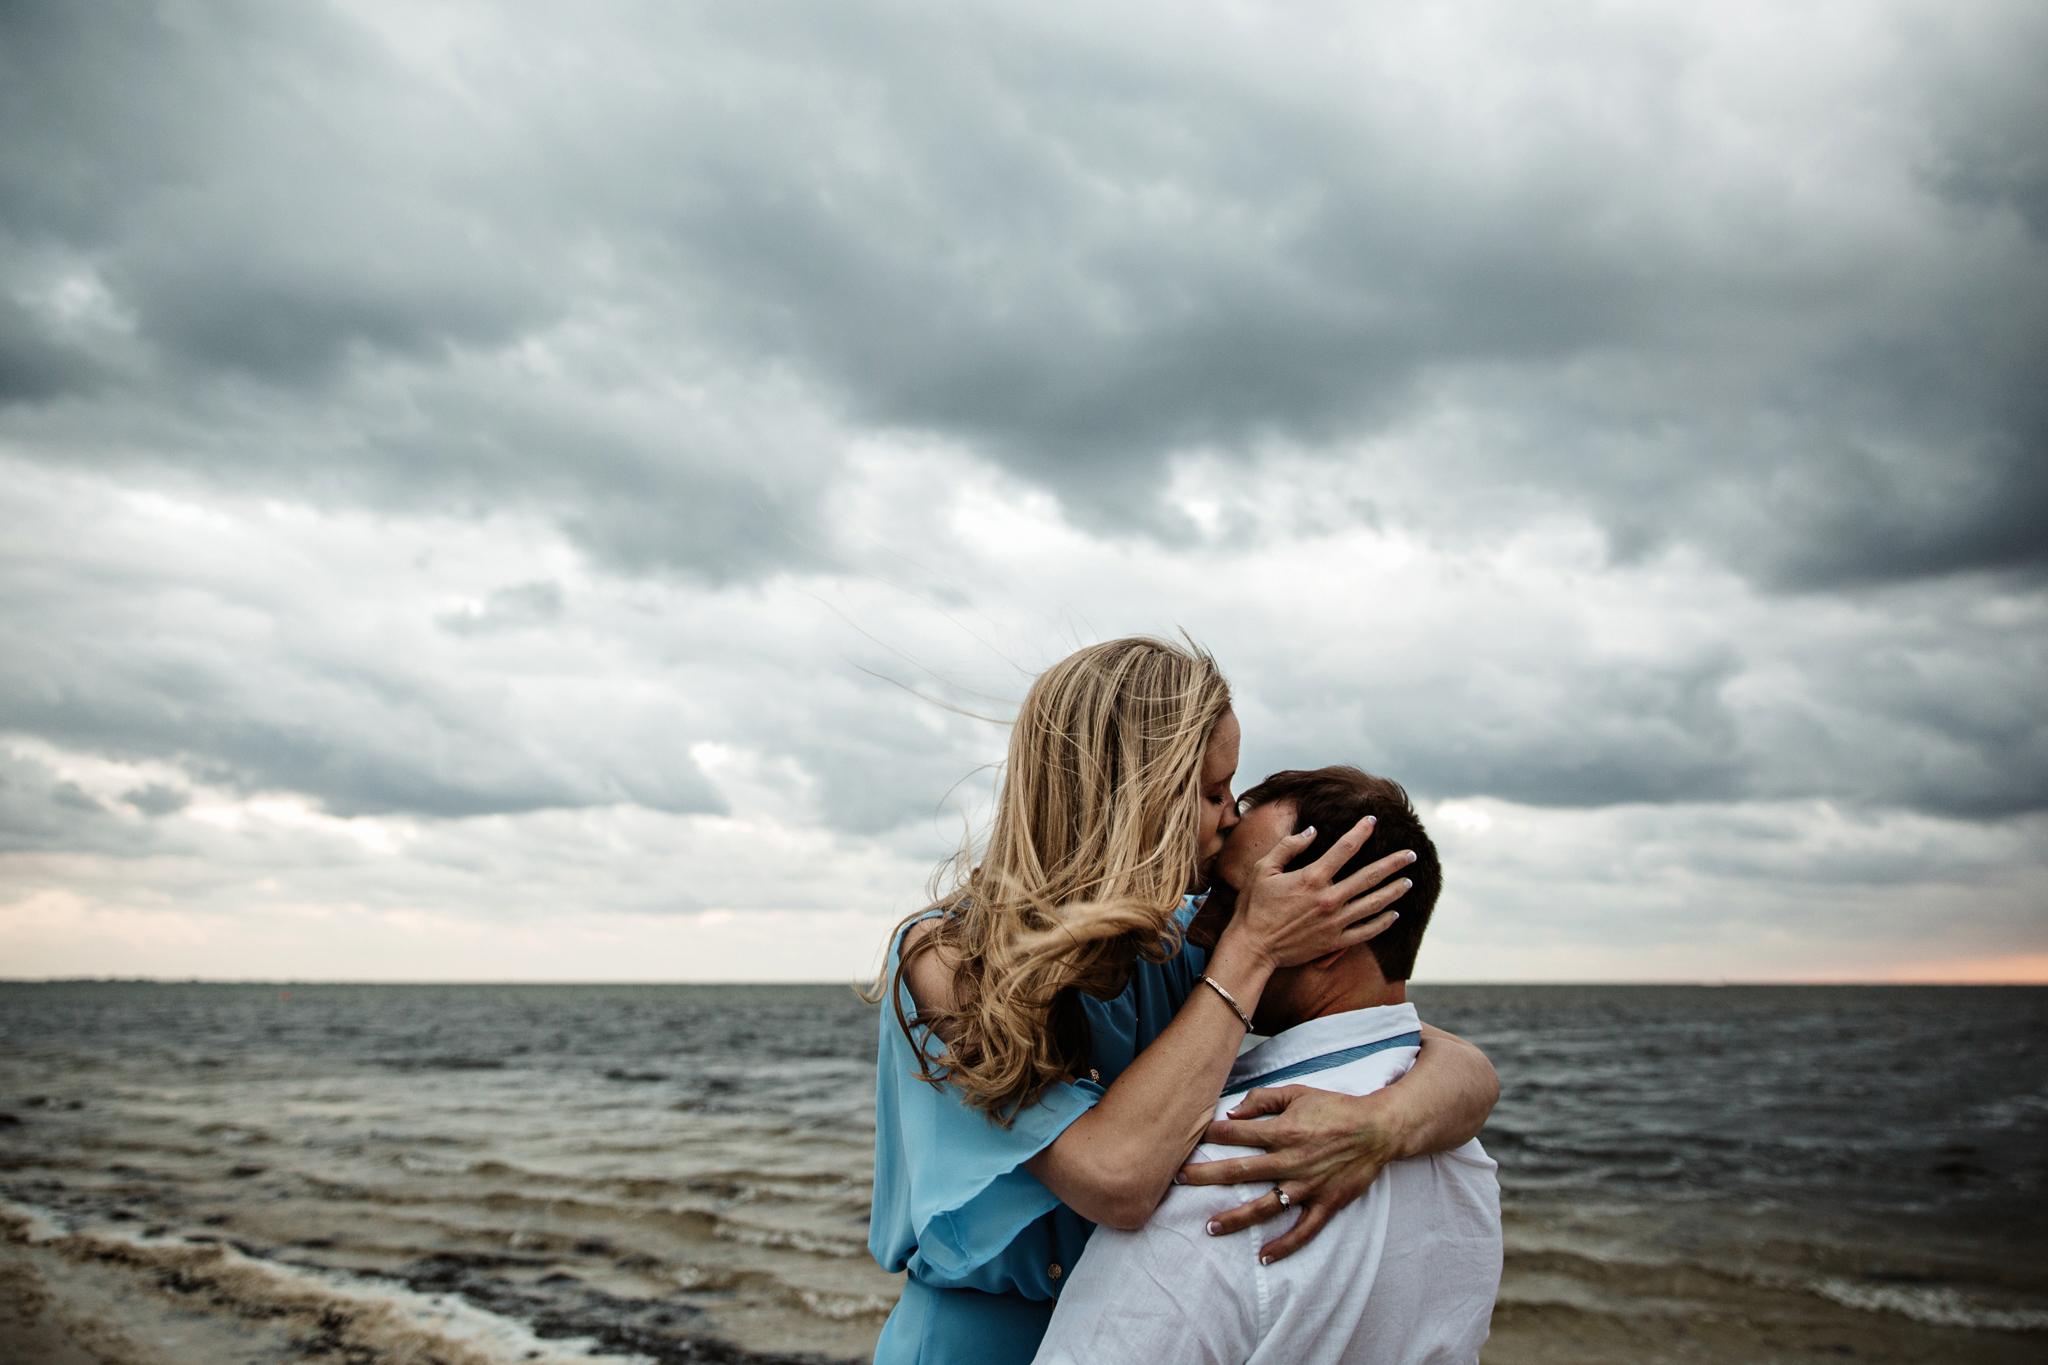 Jonathan&BrittanyEngagementSOCIALMEDIA-46.jpg